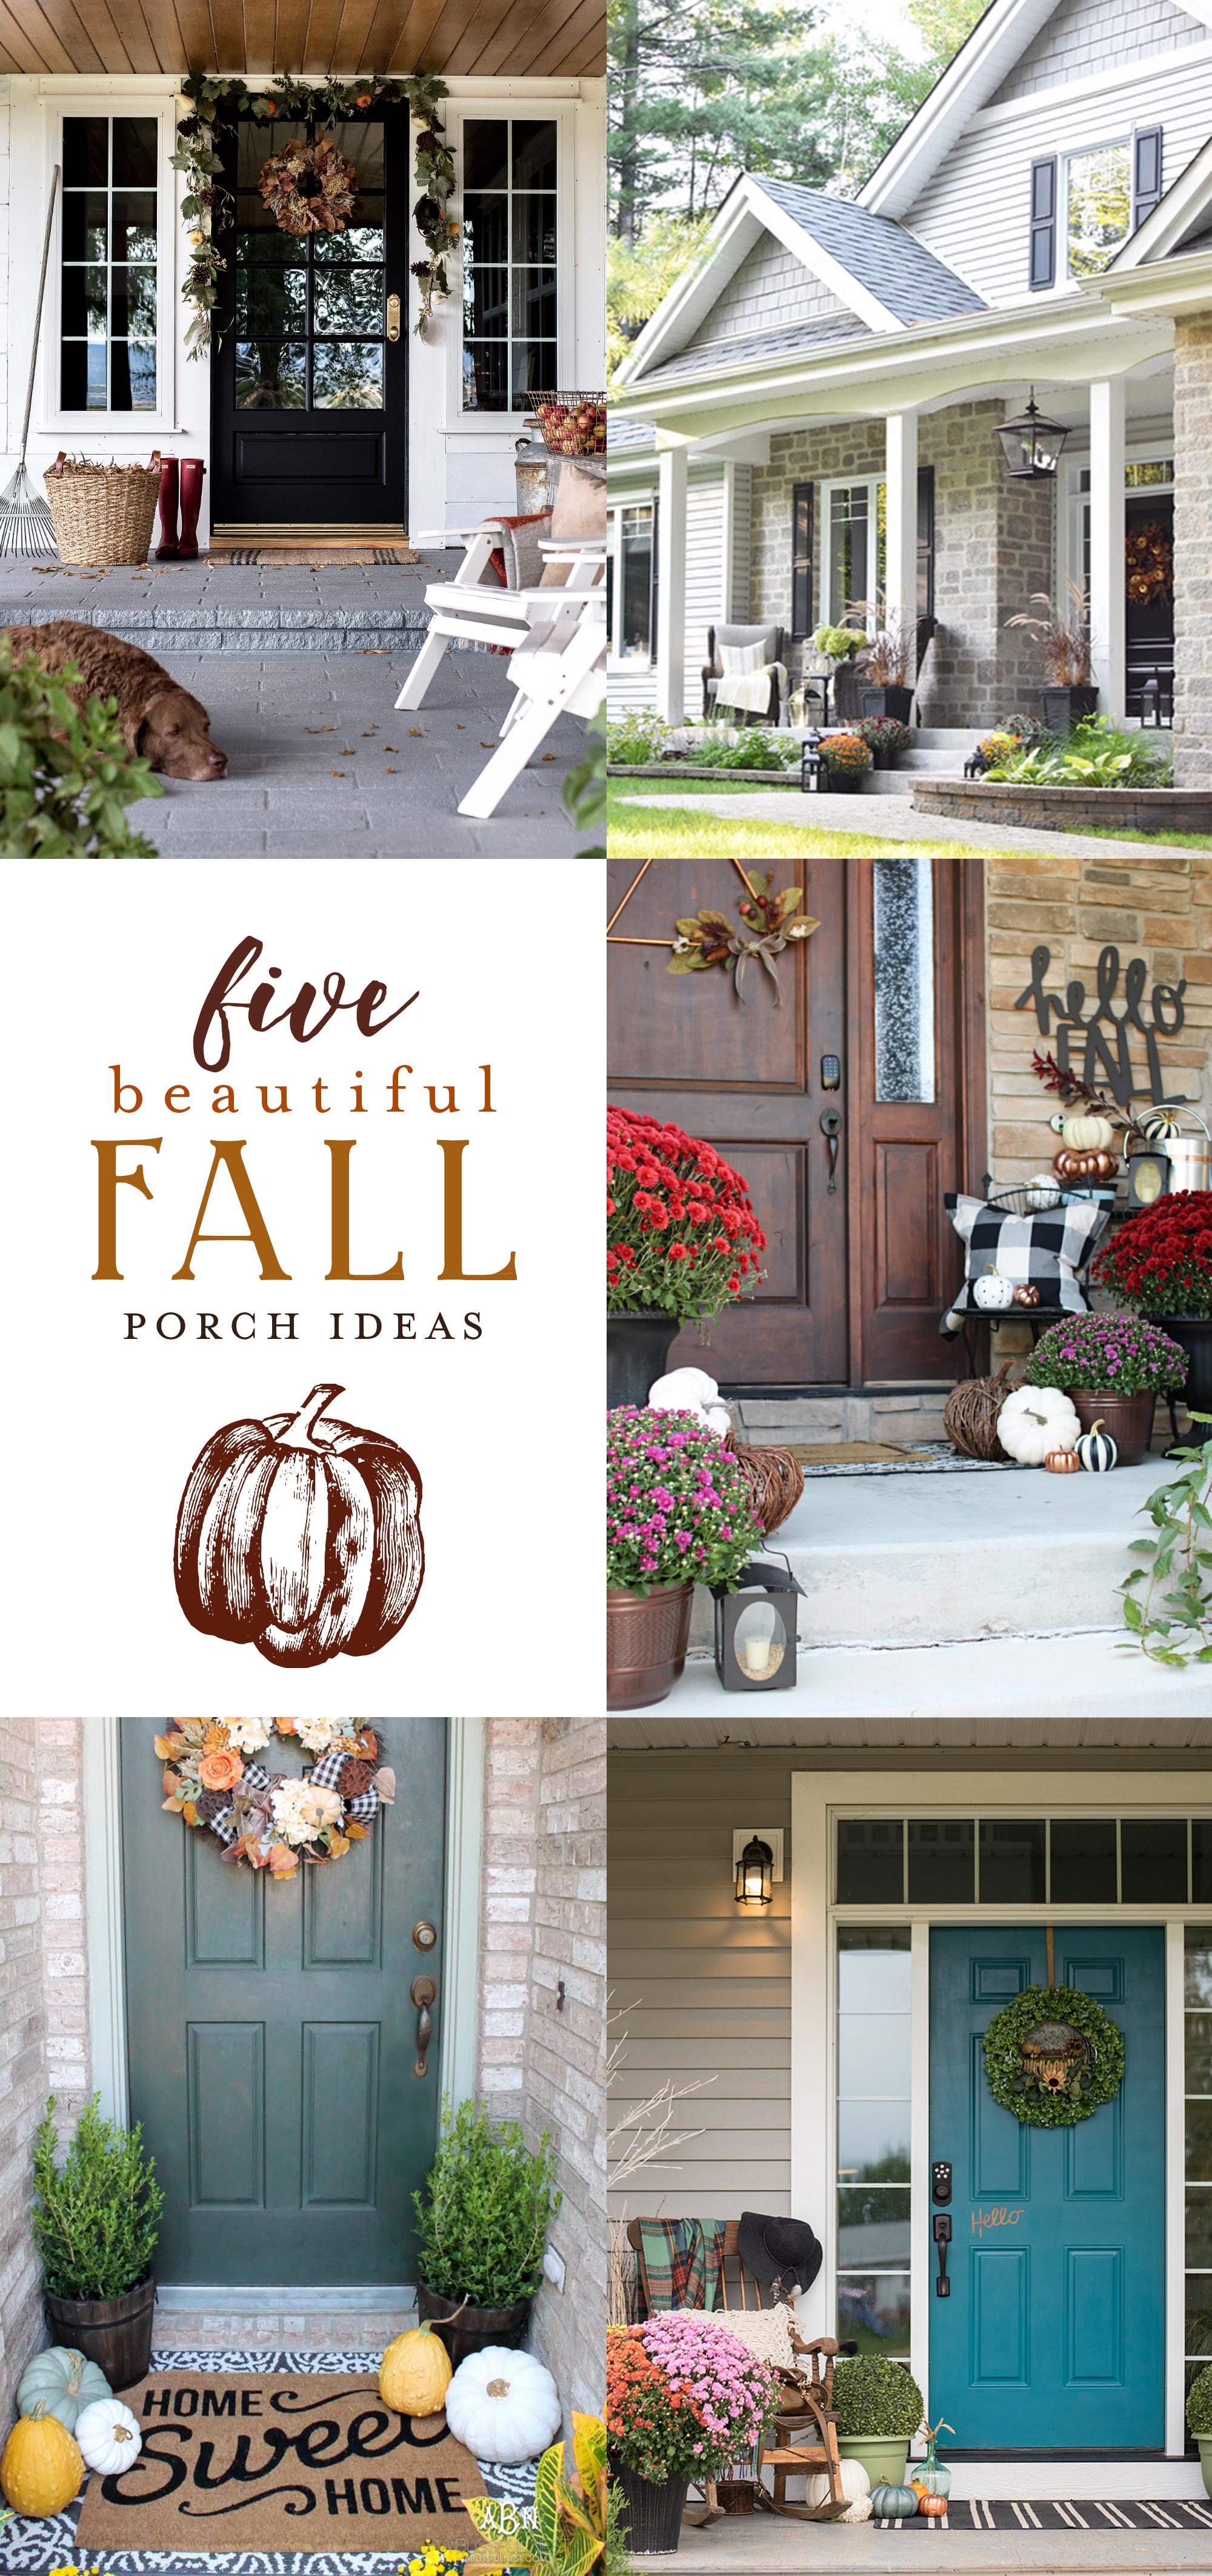 Five beautiful fall porch ideas